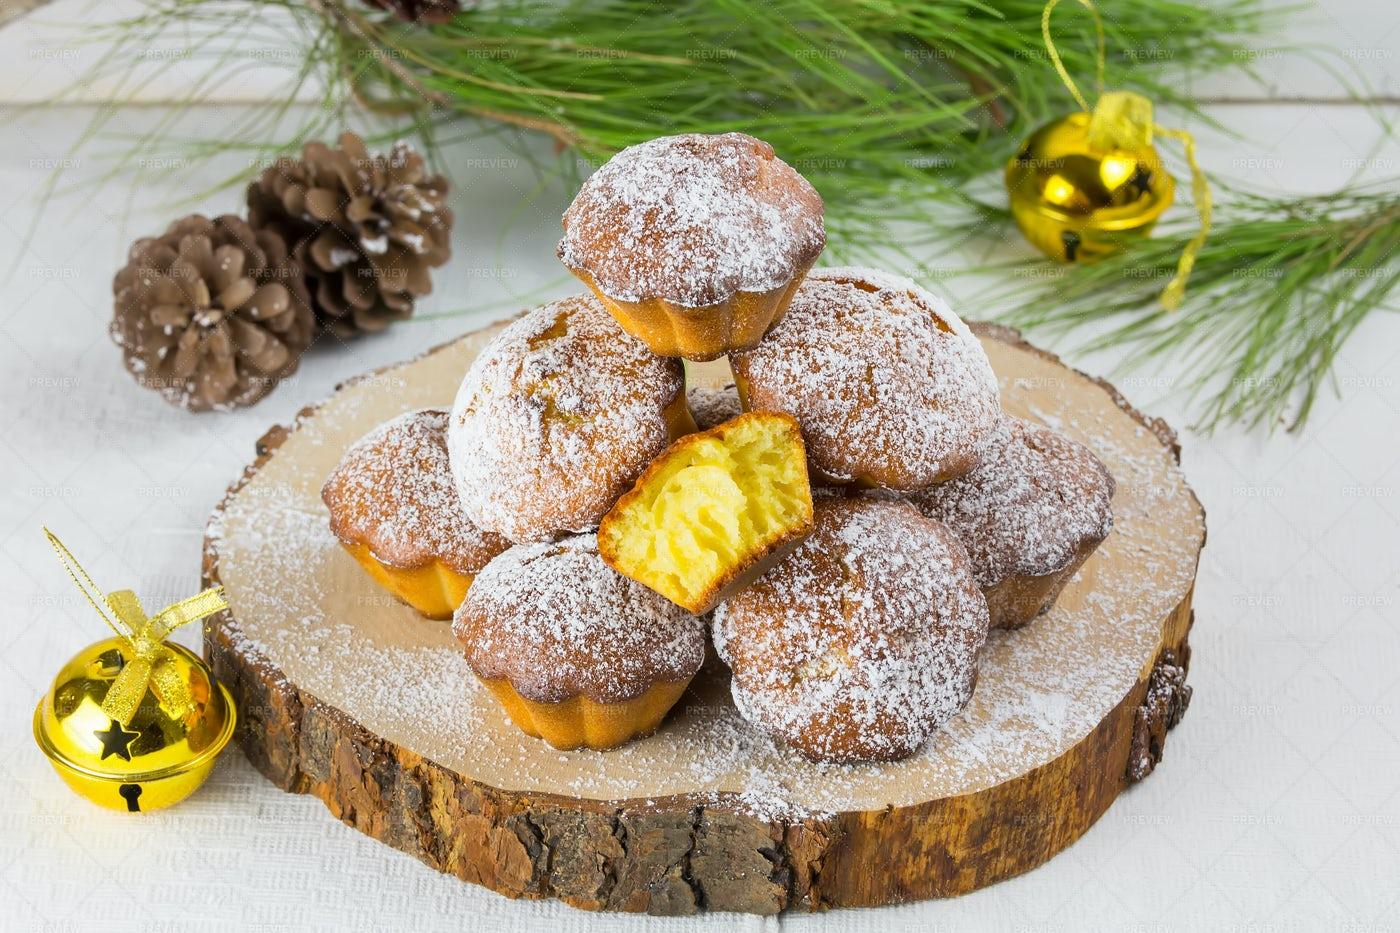 Homemade Christmas Muffins: Stock Photos